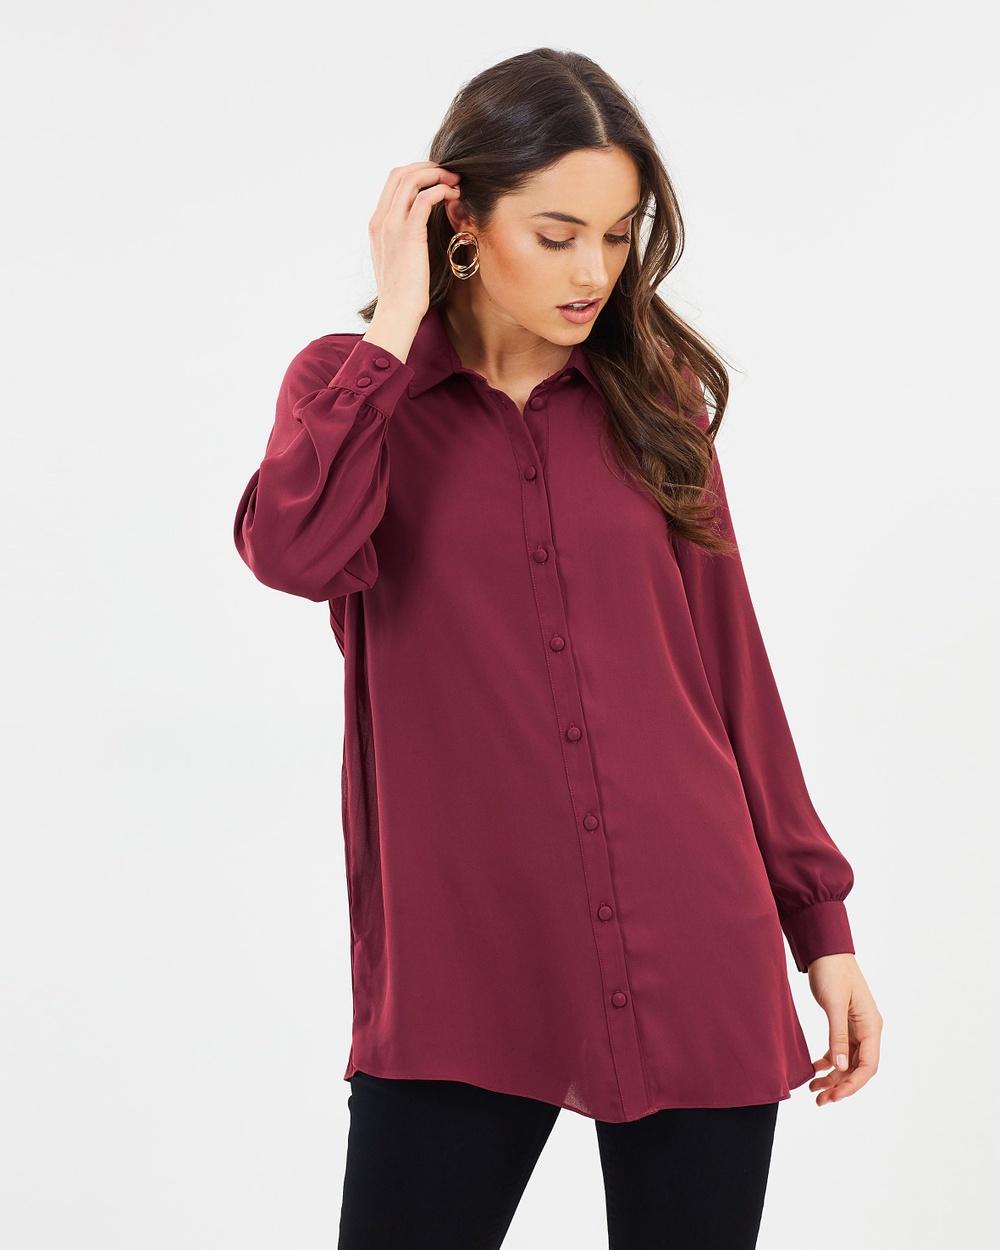 Wallis Back Pleat Shirt Tops Burgundy Back Pleat Shirt